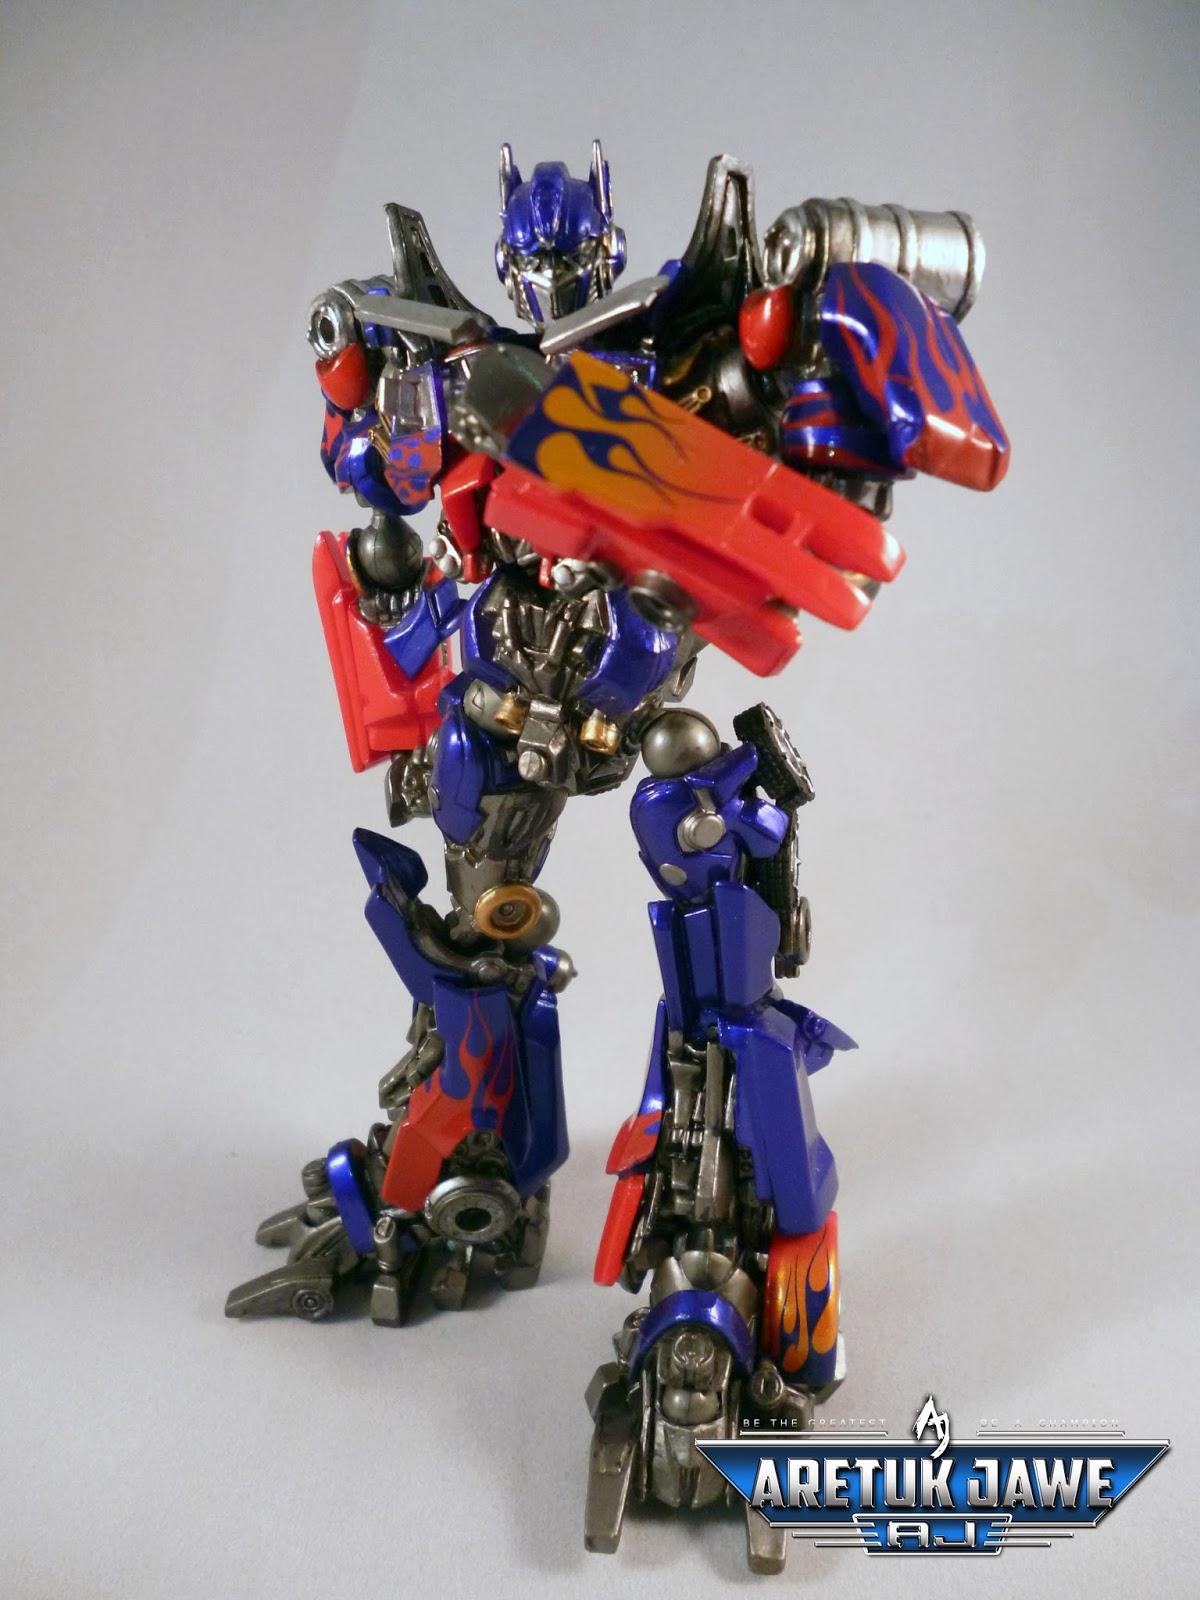 Sci Fi Transformer : Aretuk jawe sci fi revoltech series no optimus prime